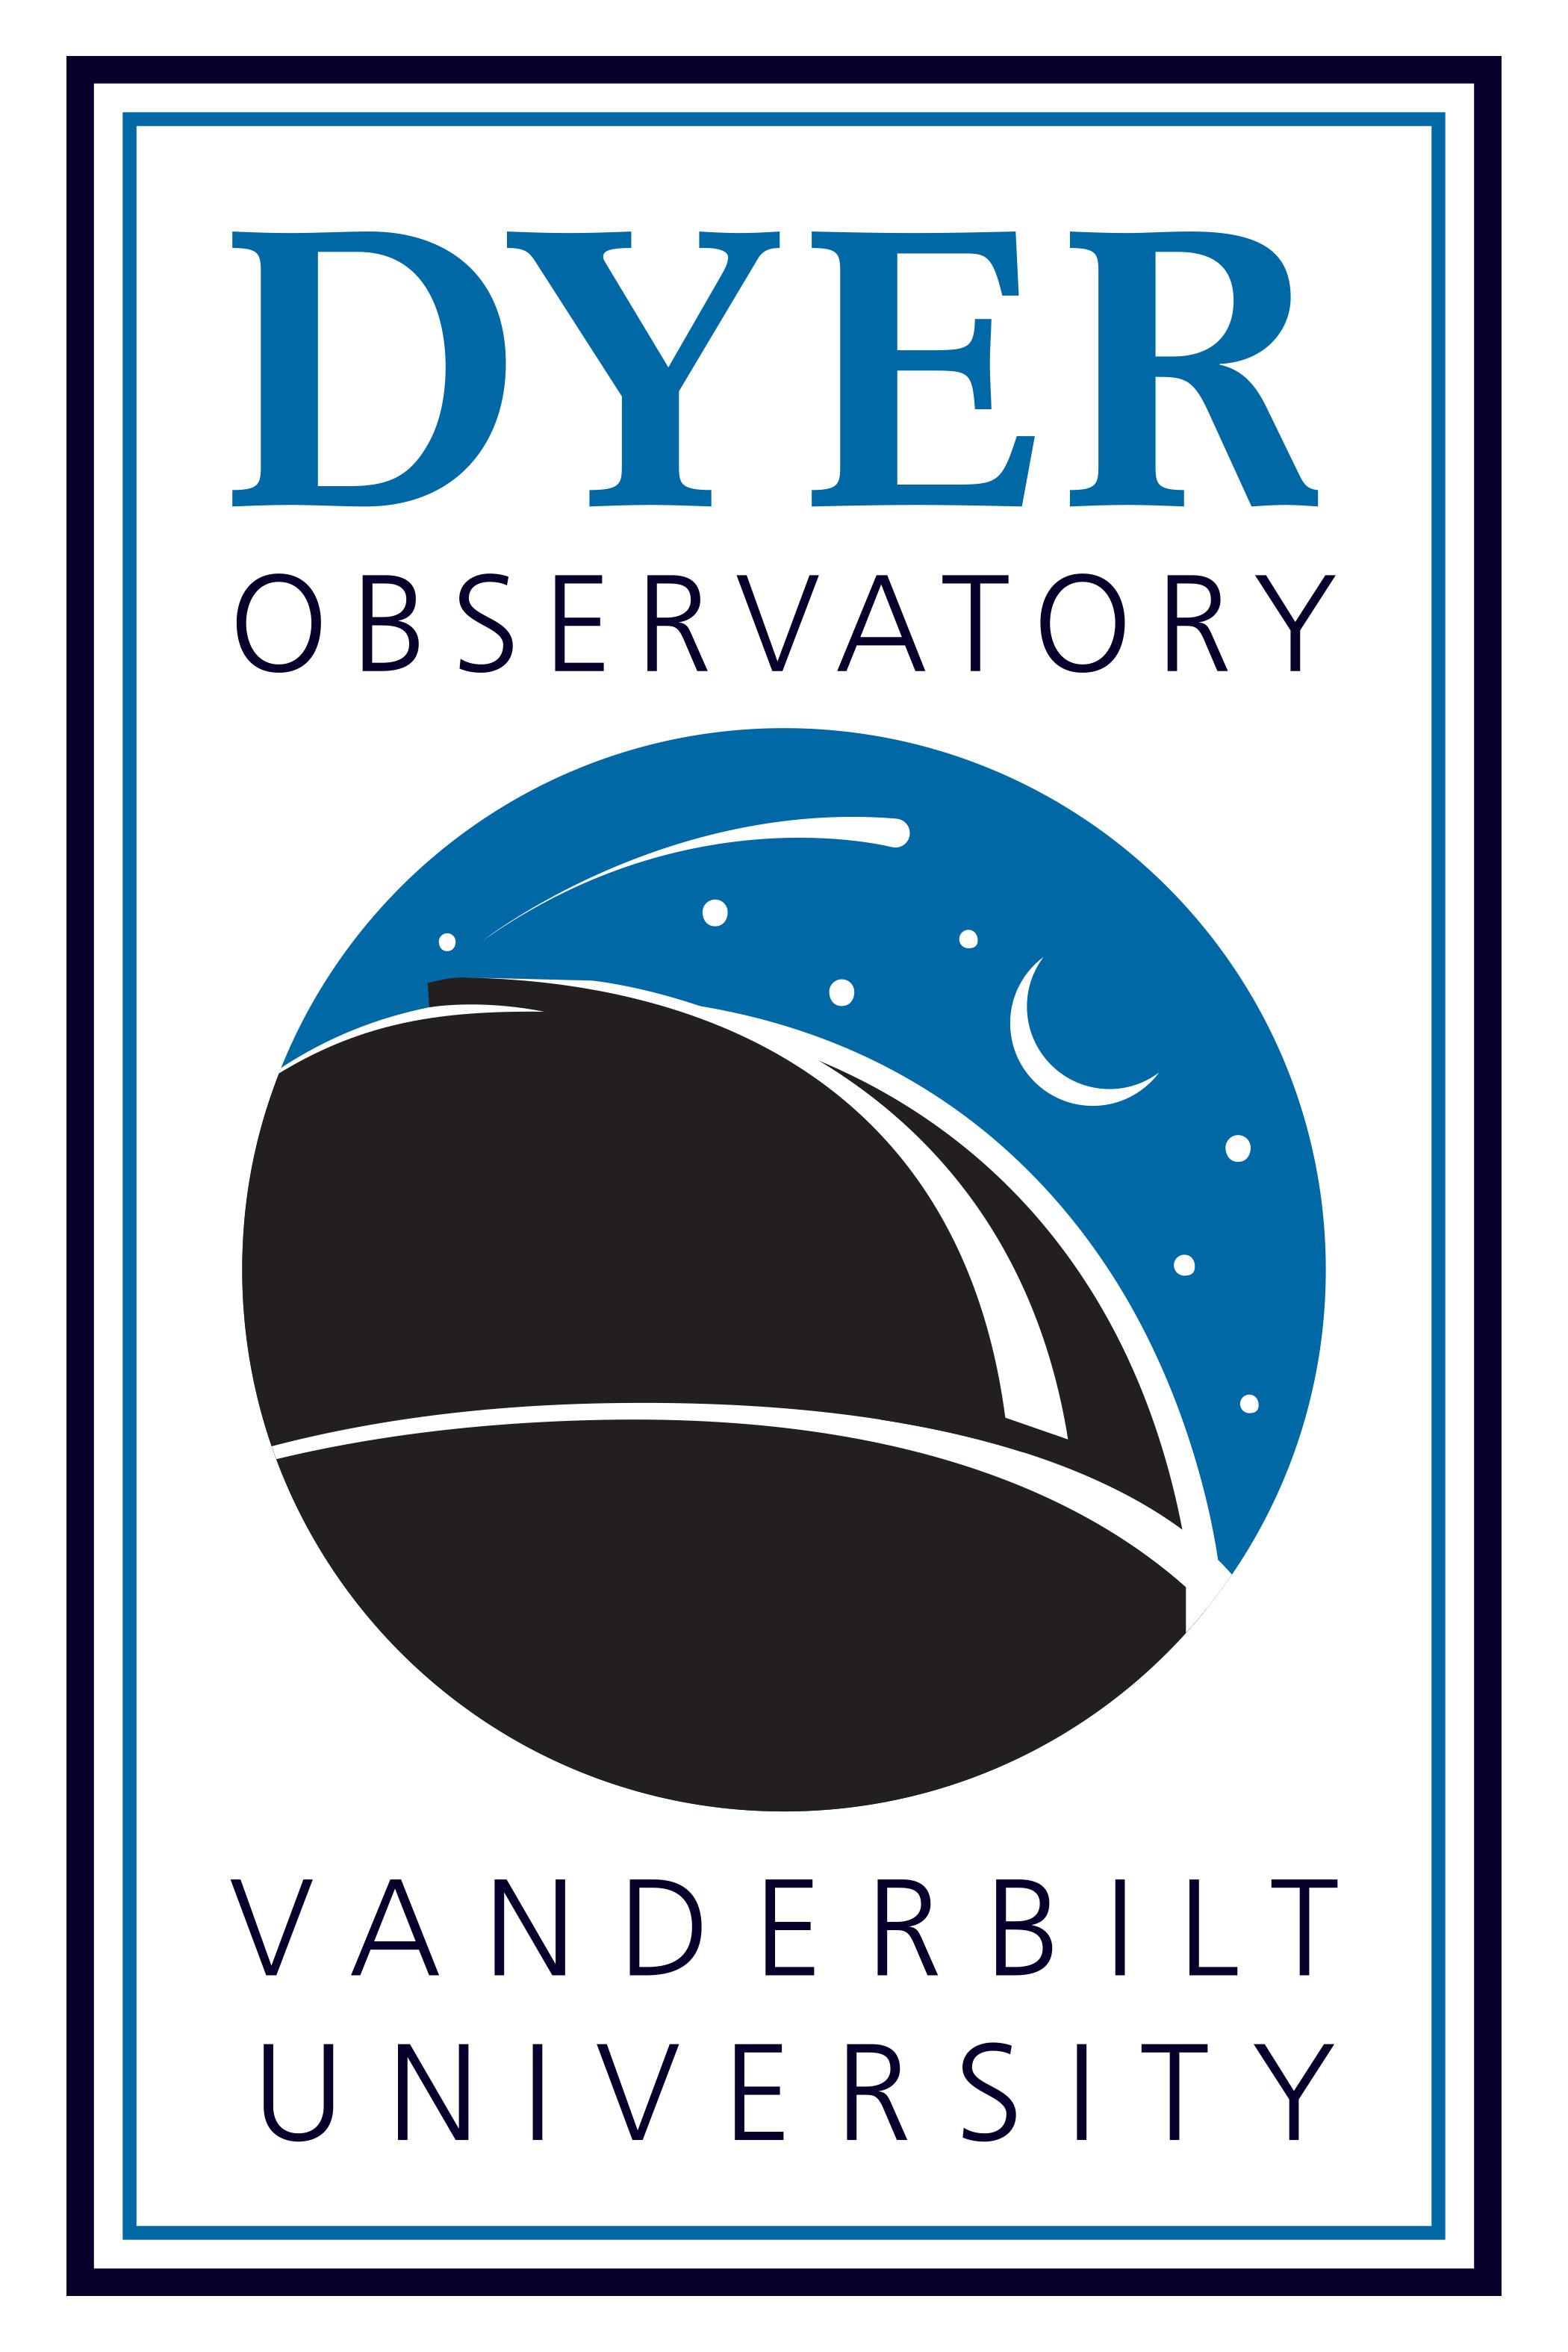 Vanderbilt Dyer Observatory logomark